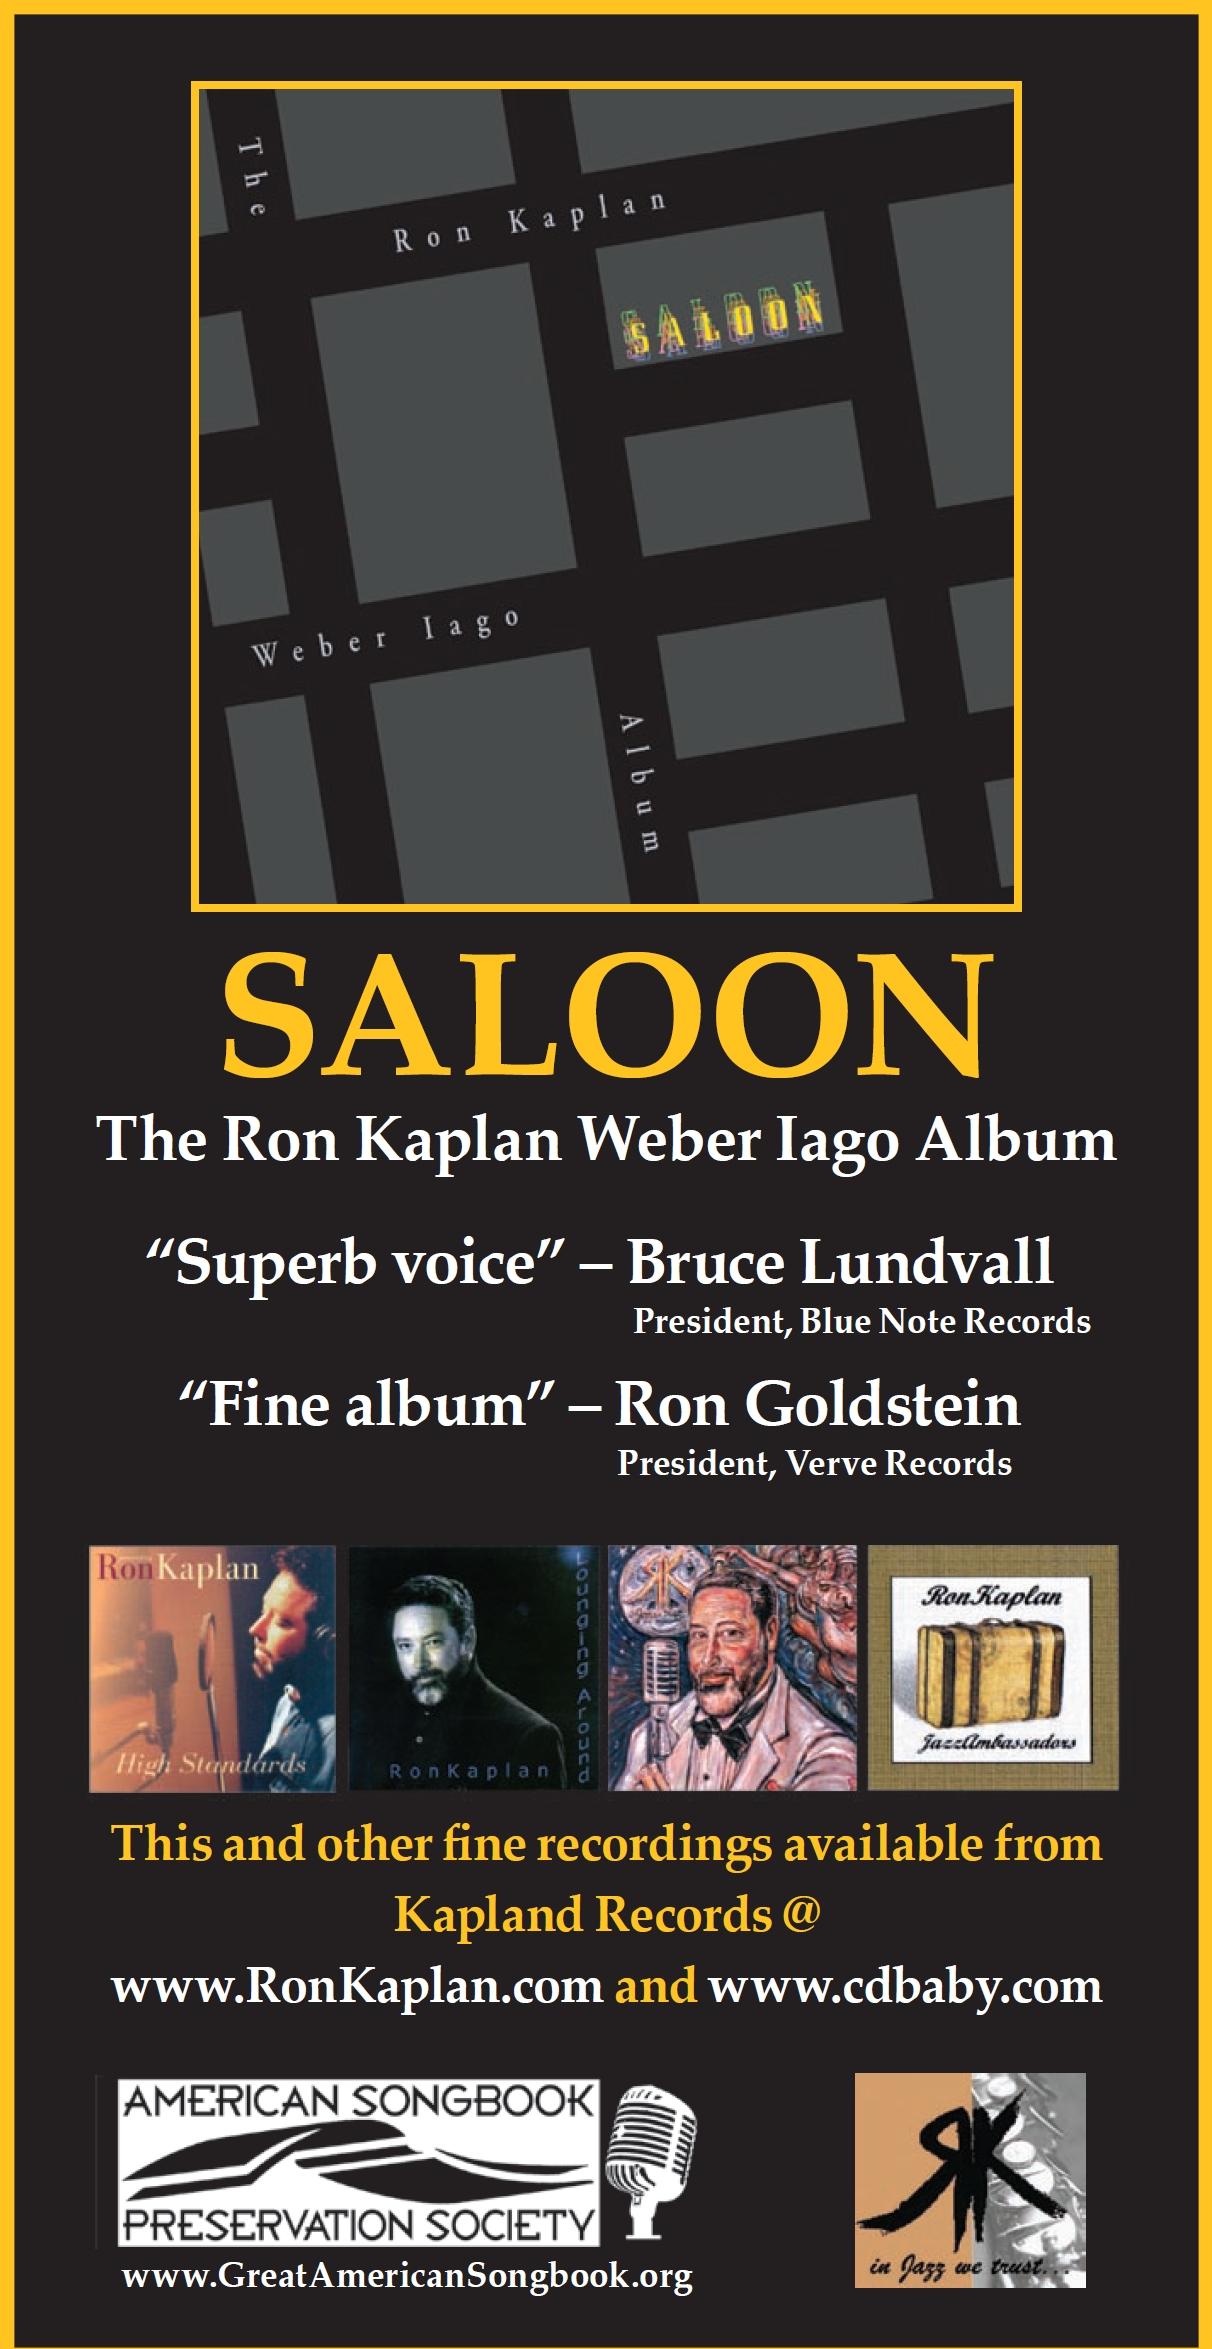 Saloon ad 2